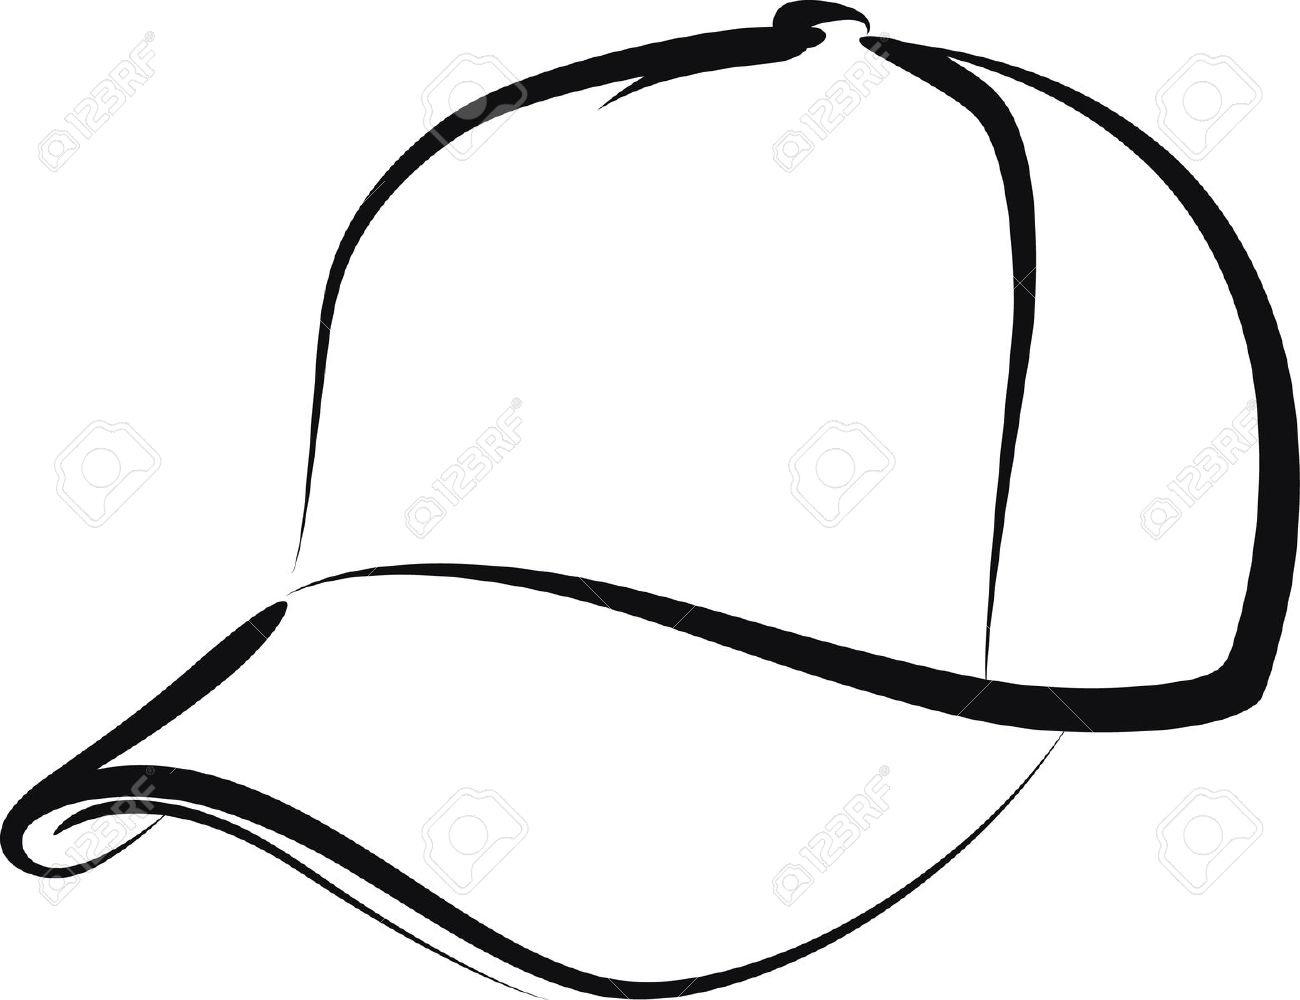 Cap clipart baseball cap, Cap baseball cap Transparent FREE.